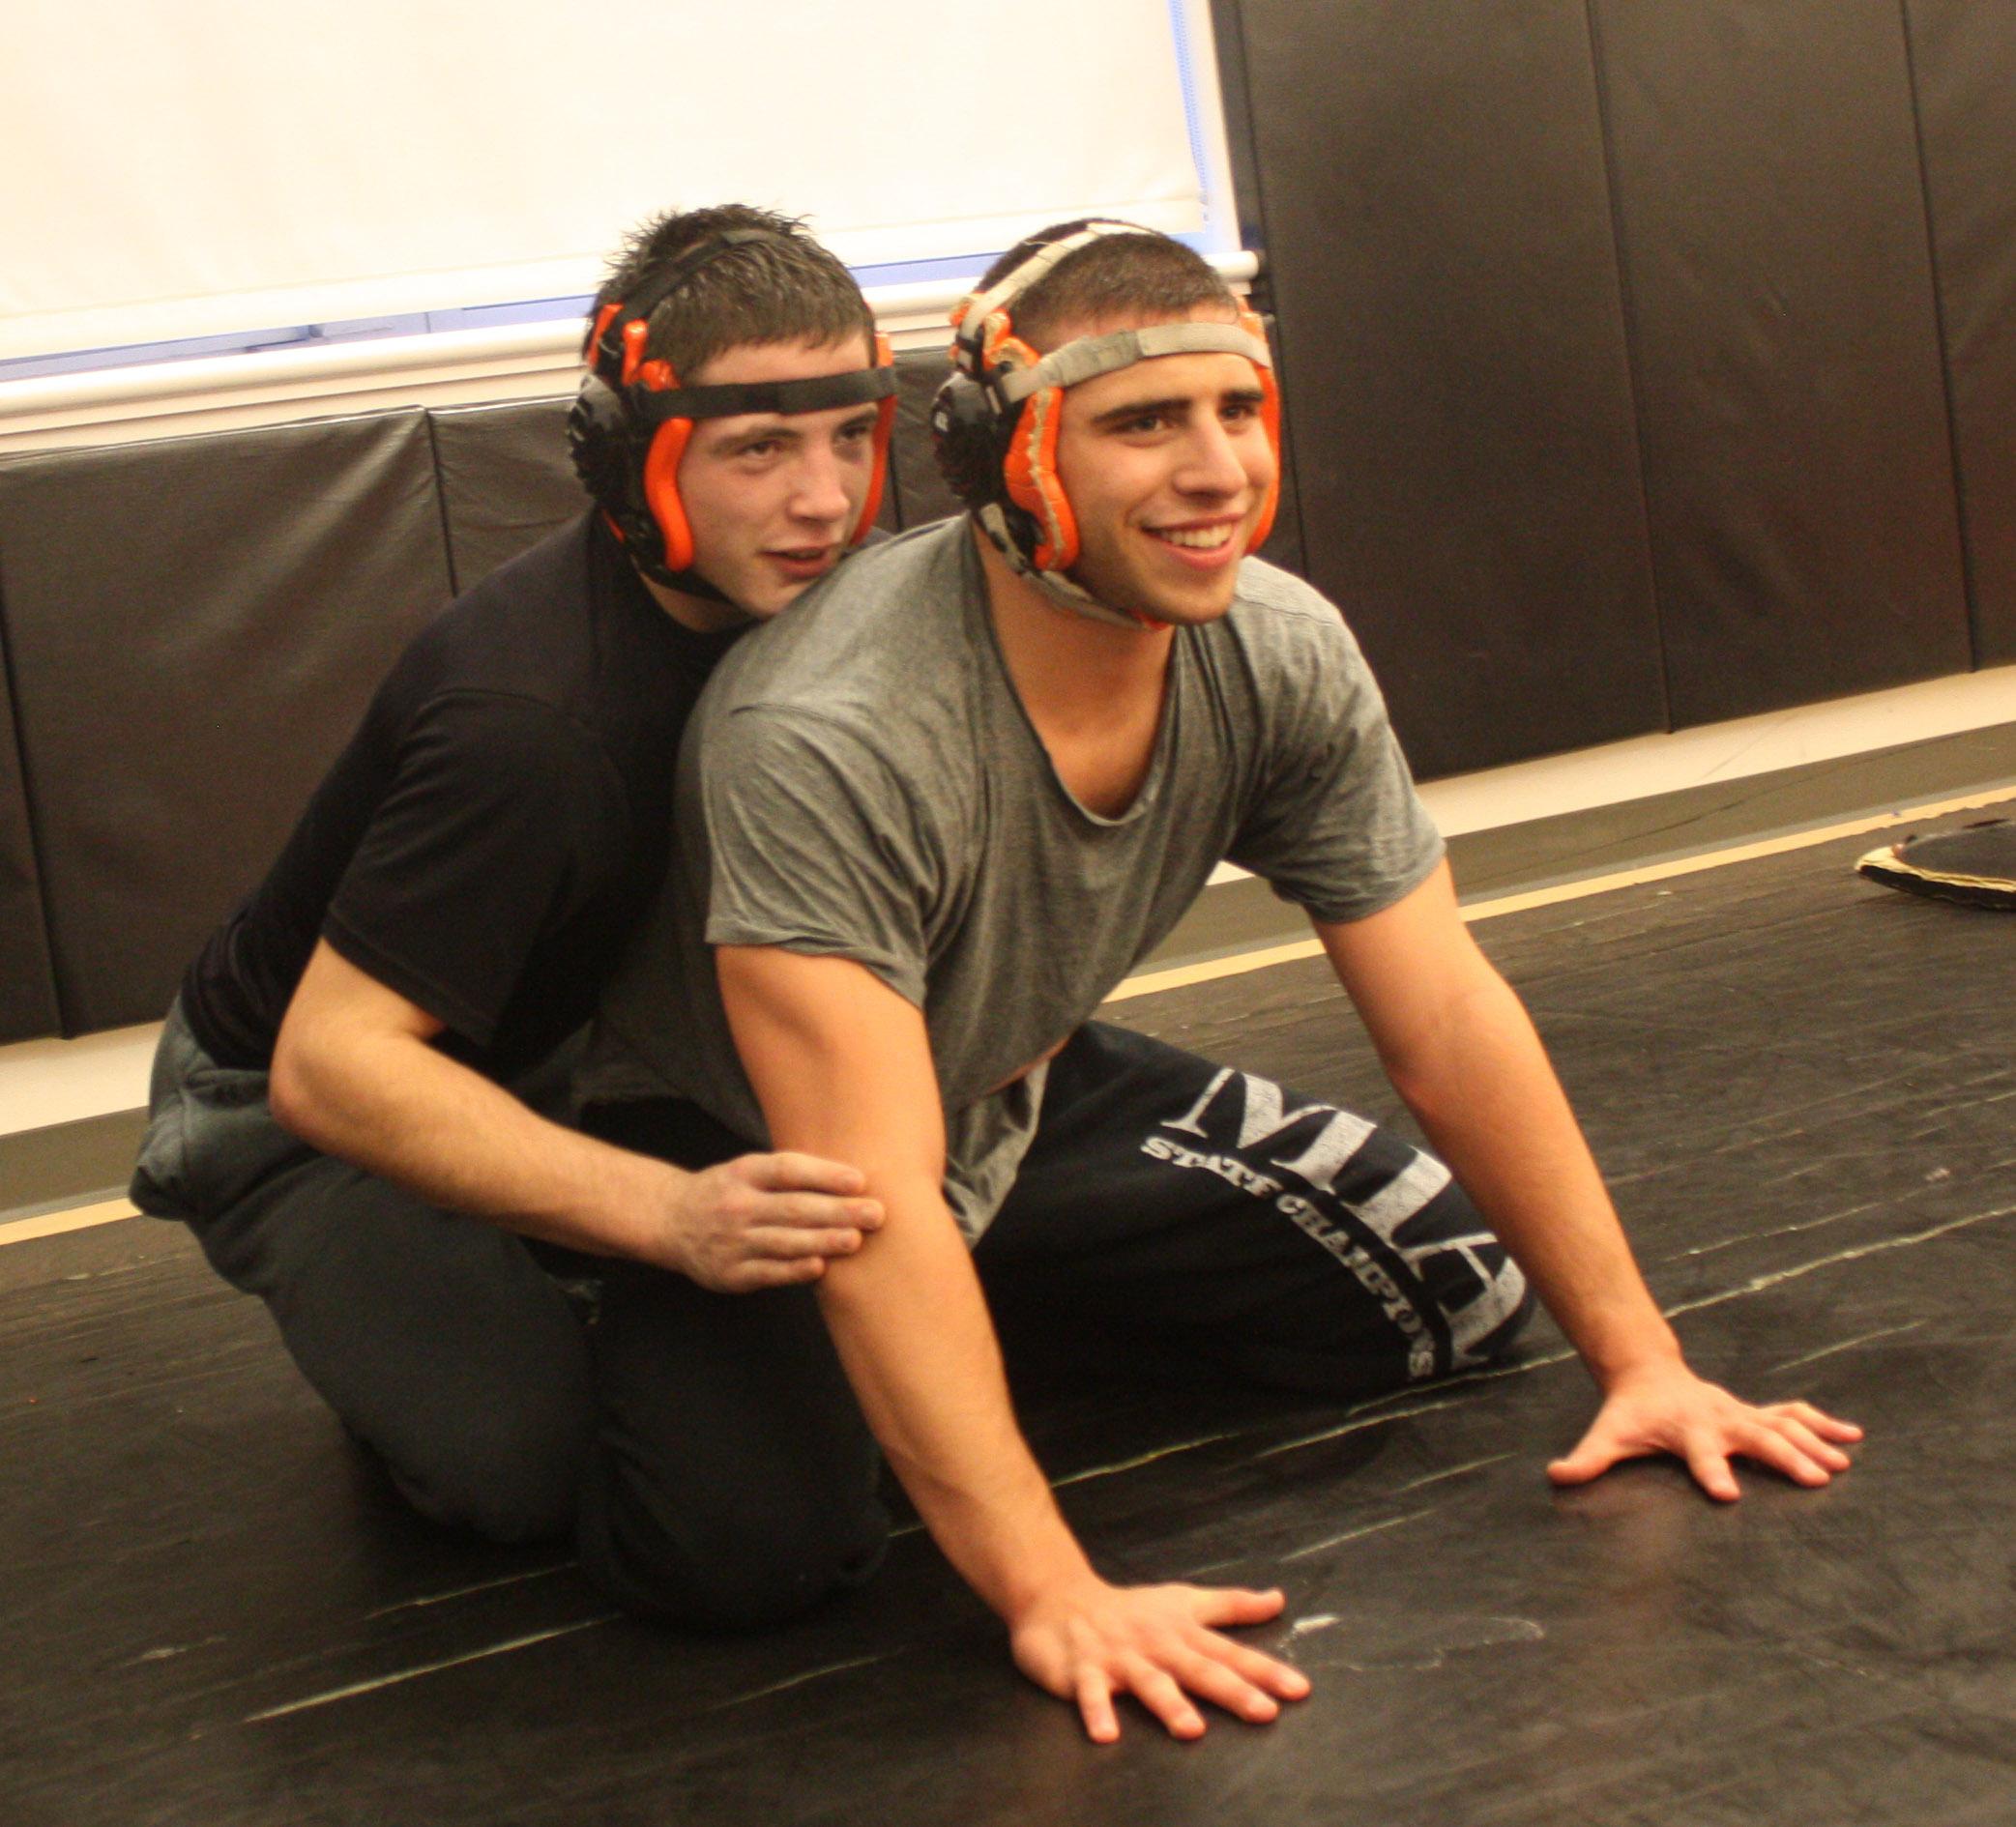 Senior Nick Mariano wrestles with Jordan Long '12 in the dance studio Friday.